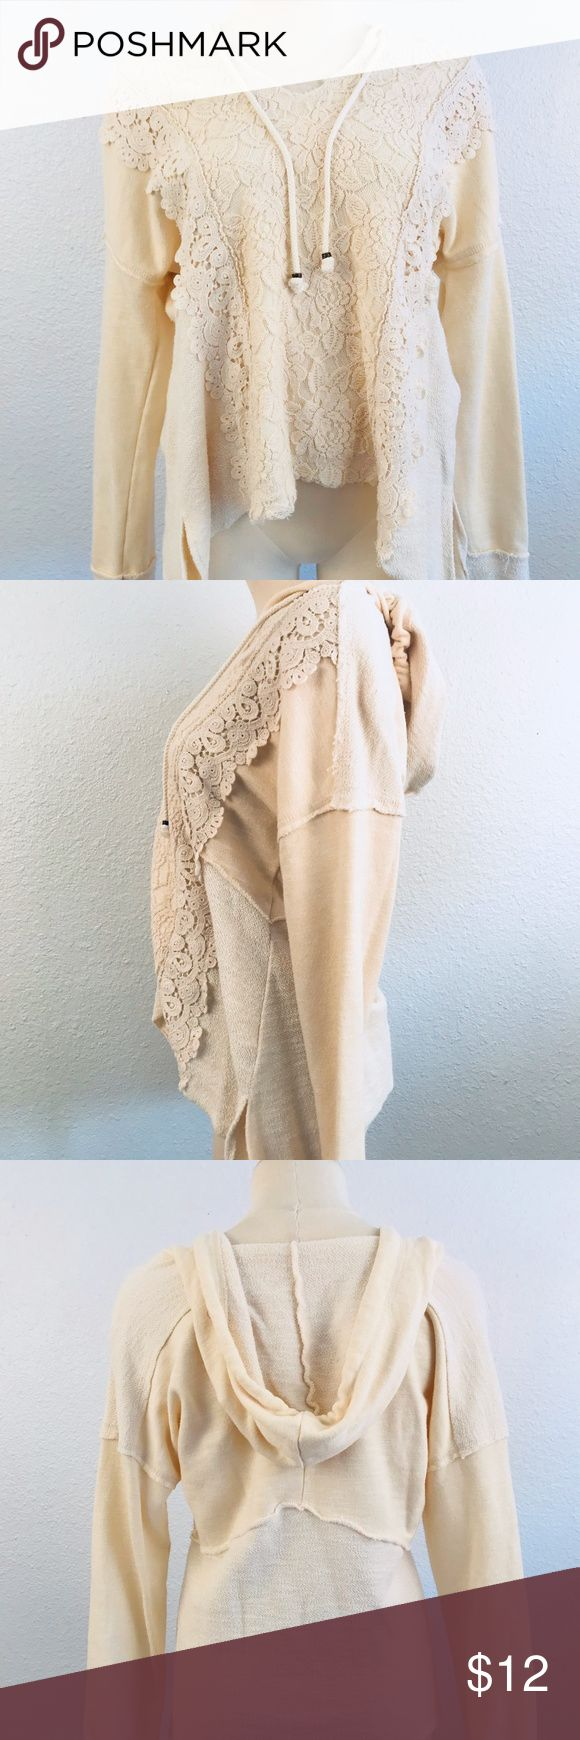 Cato Heavy Lace Cream Hoodie Women's Medium Cato Heavy Lace Cream Hoodie  Women's Medium Super Cute Hoodie in Excellent Condition.  No Flaws. Cato Tops Sweatshirts & Hoodies